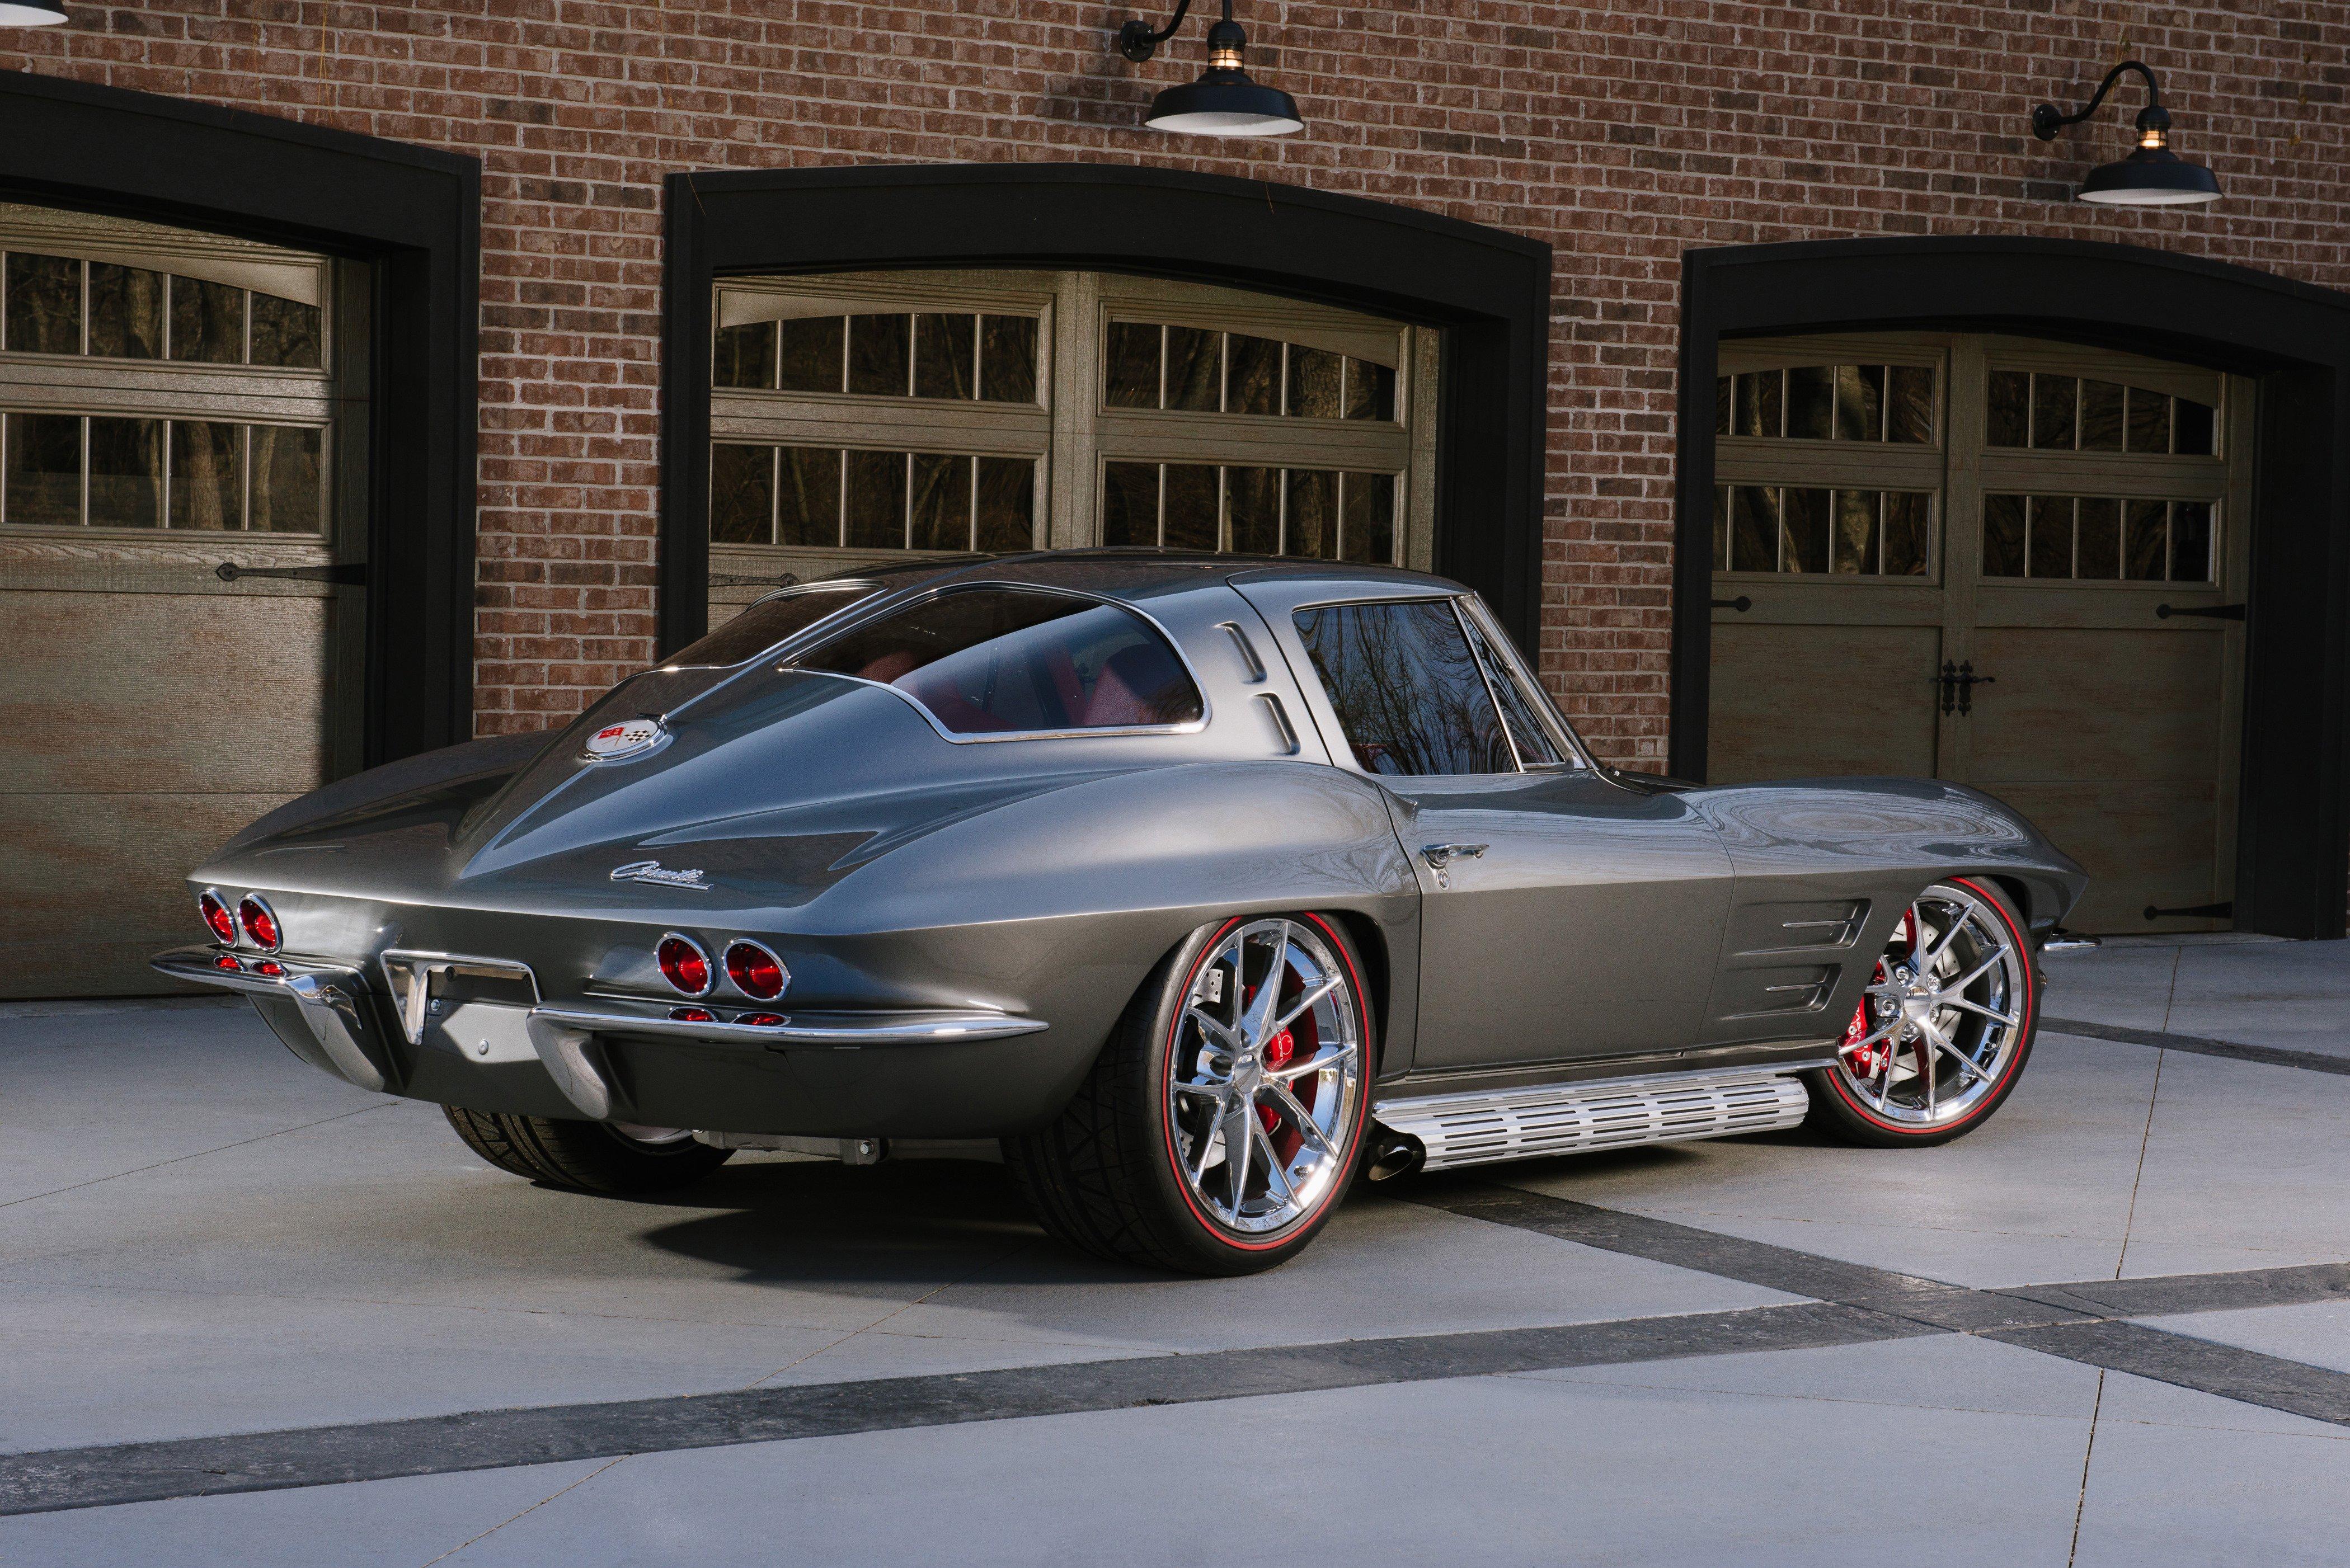 1963 Chevrolet Corvette Streetrod Street Rod Hot Muscle